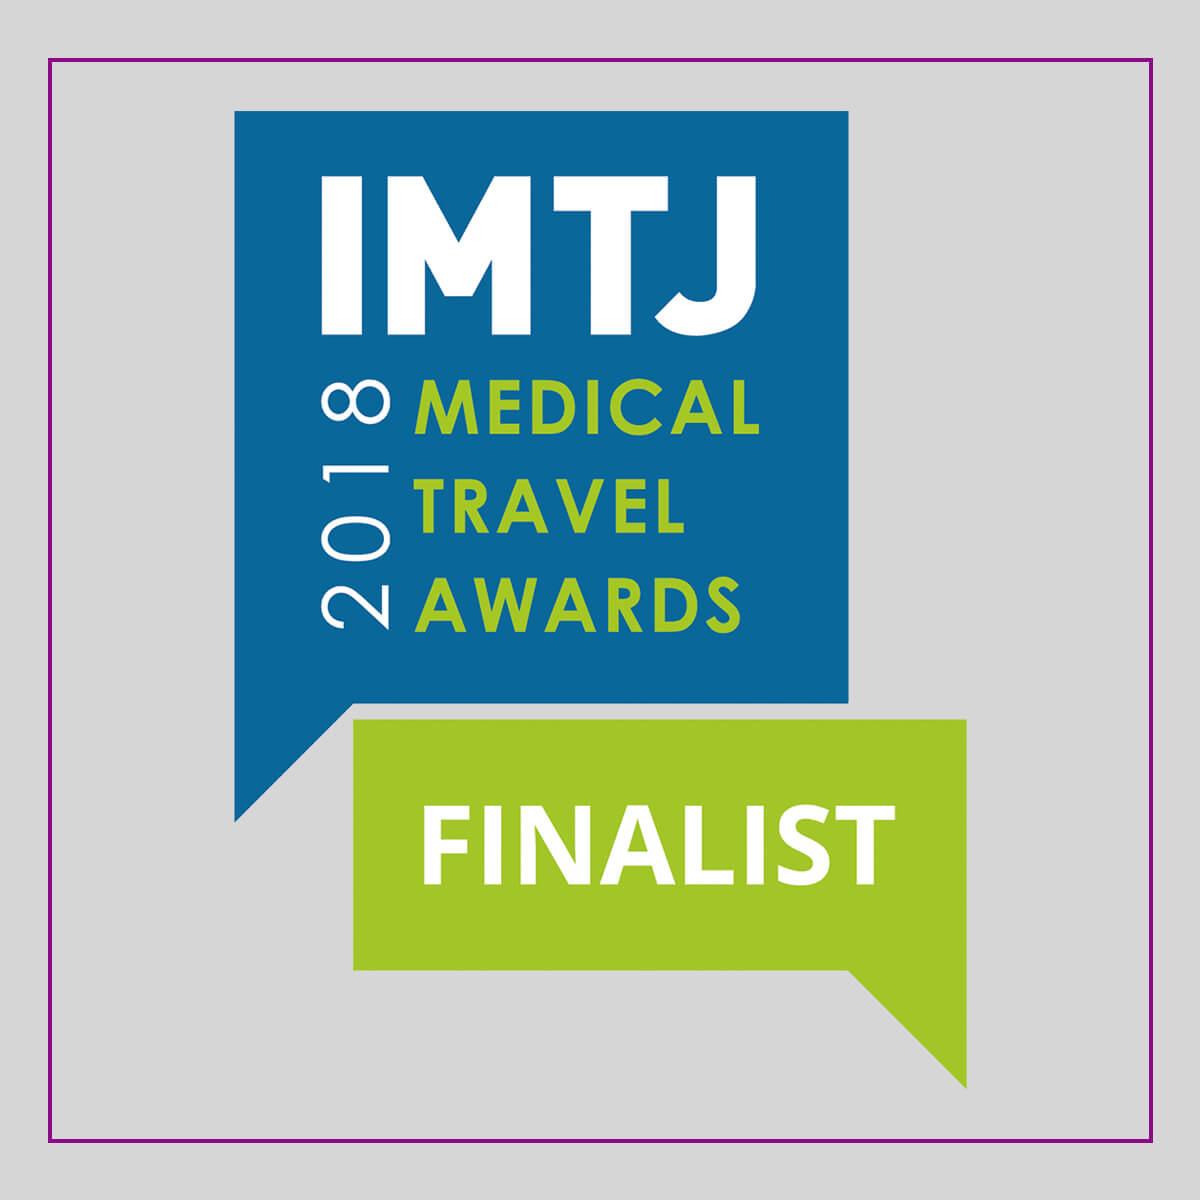 2018 Medical Travel Awards Finalist